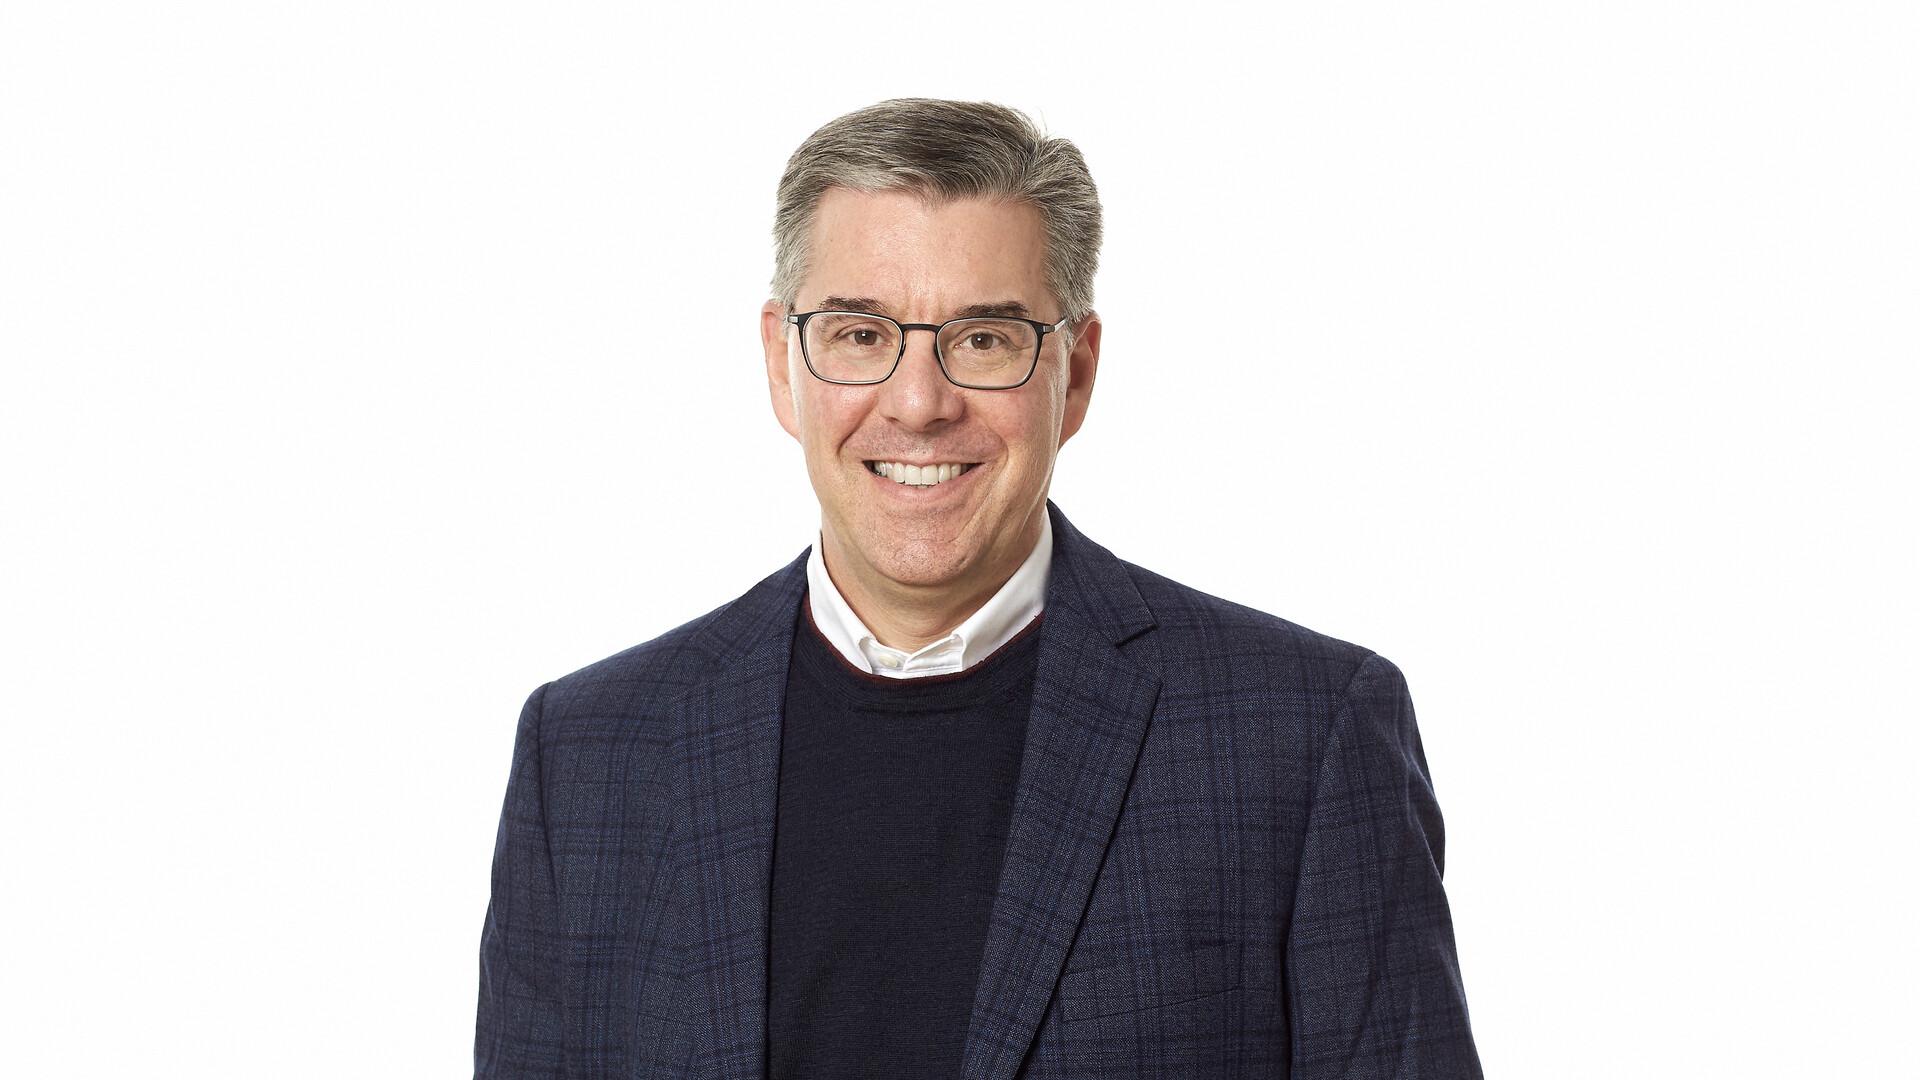 Michael Zarin, Vice President, Group Communications